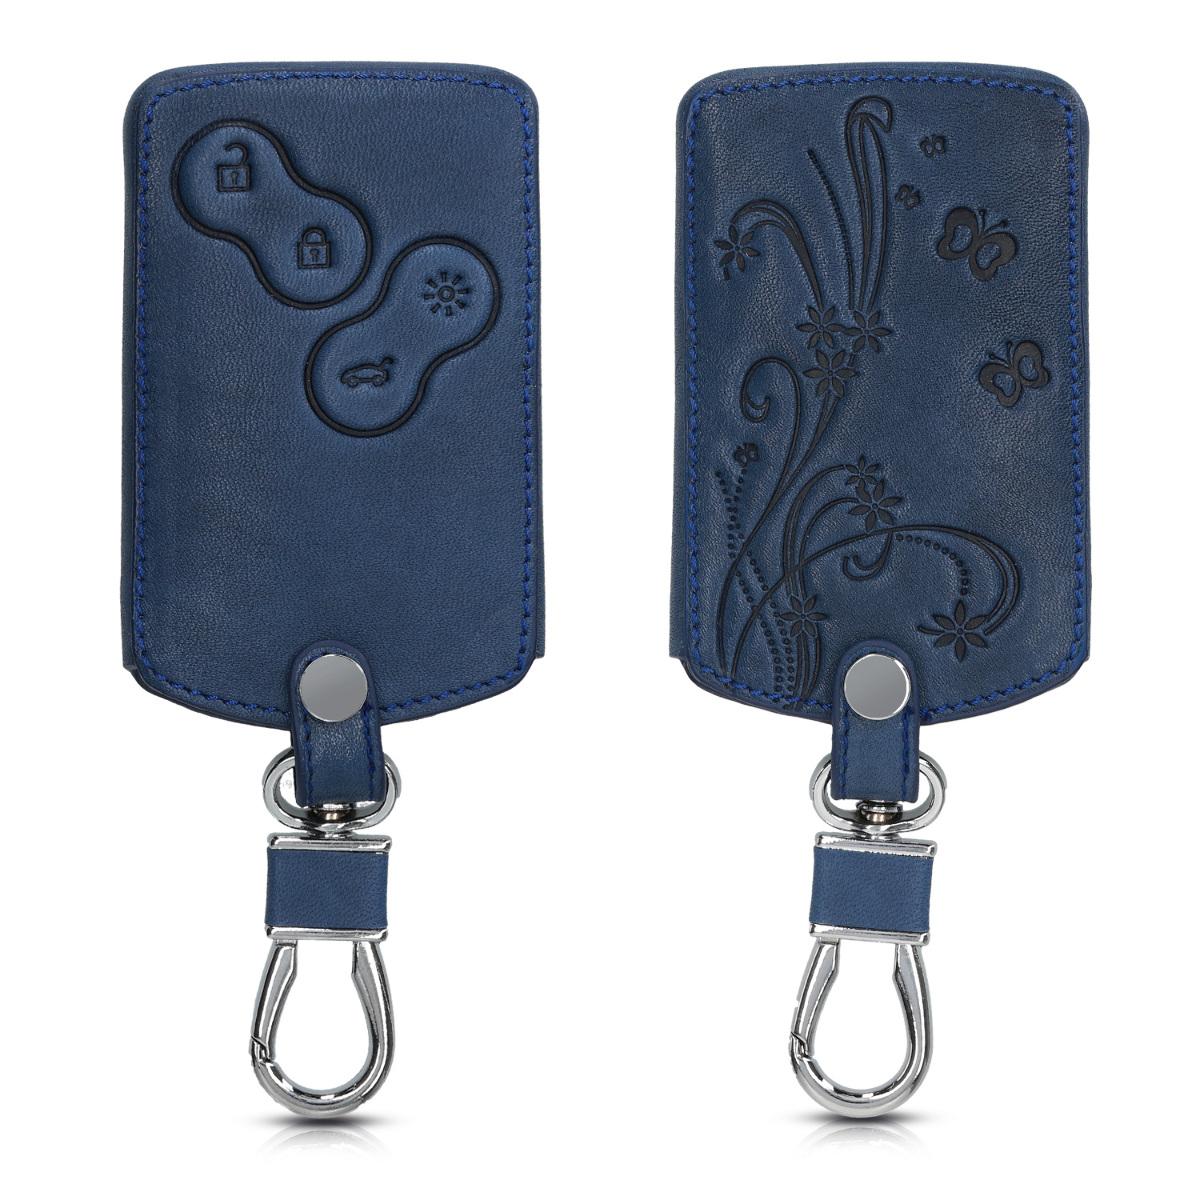 KW Θήκη Κλειδιού Renault - PU Leather - 4 Κουμπιά - Dark Blue (46356.11)